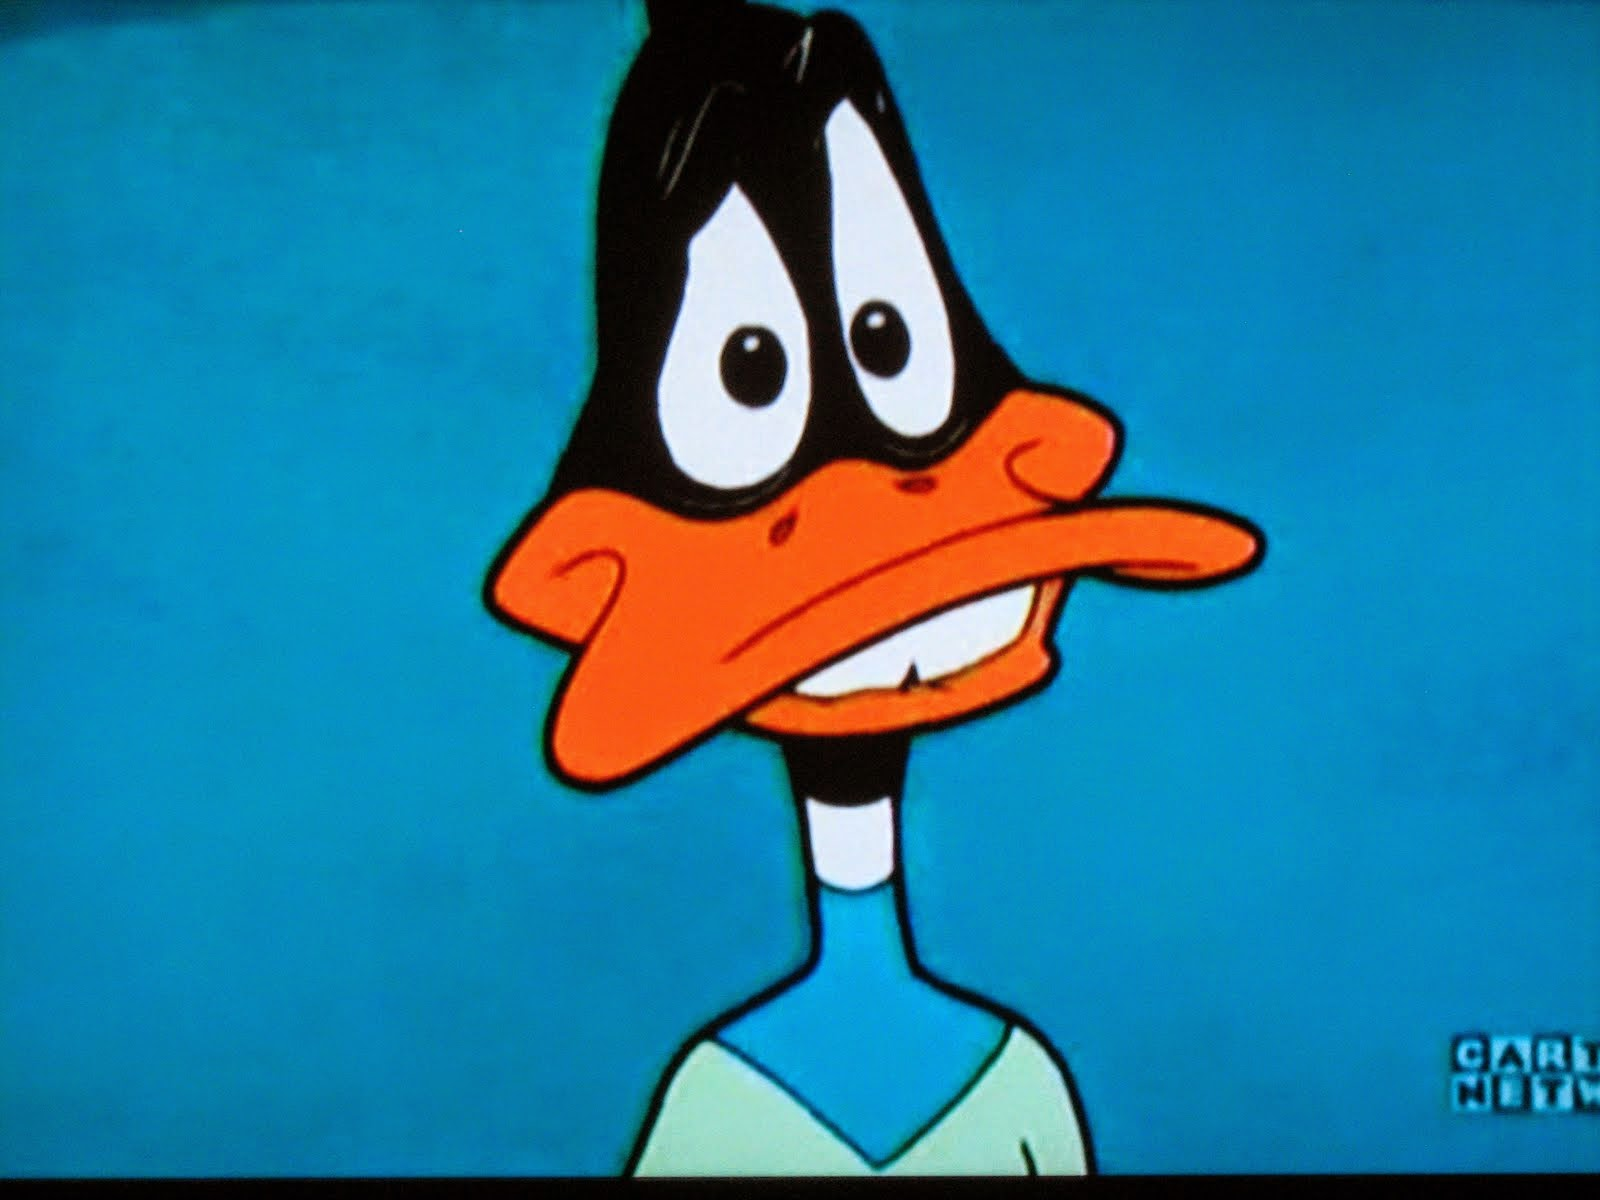 Kumpulan Gambar Duck Dodgers Gambar Lucu Terbaru Cartoon Animation